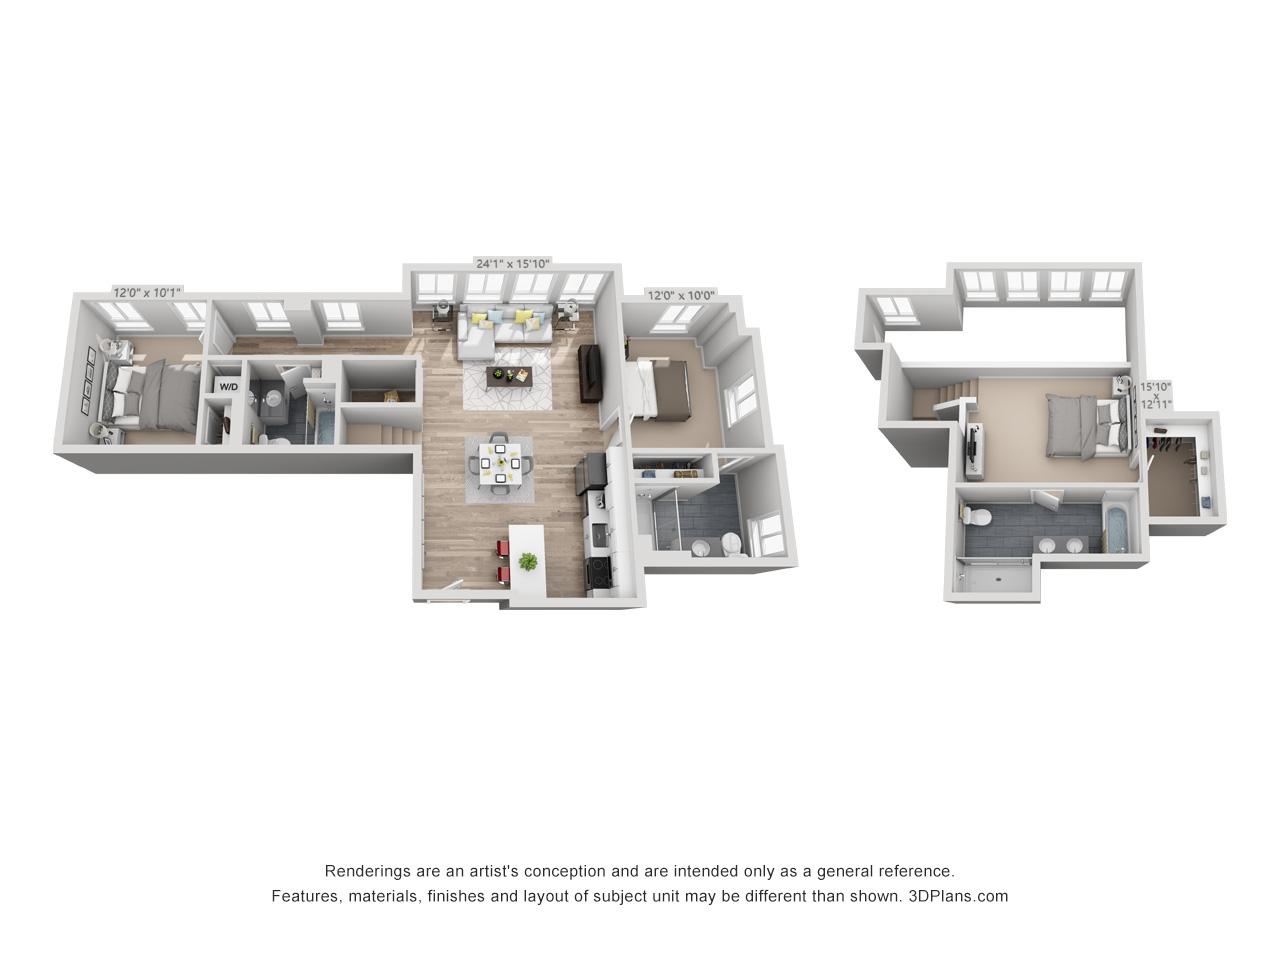 3 bedroom apartment in rittenhouse square area